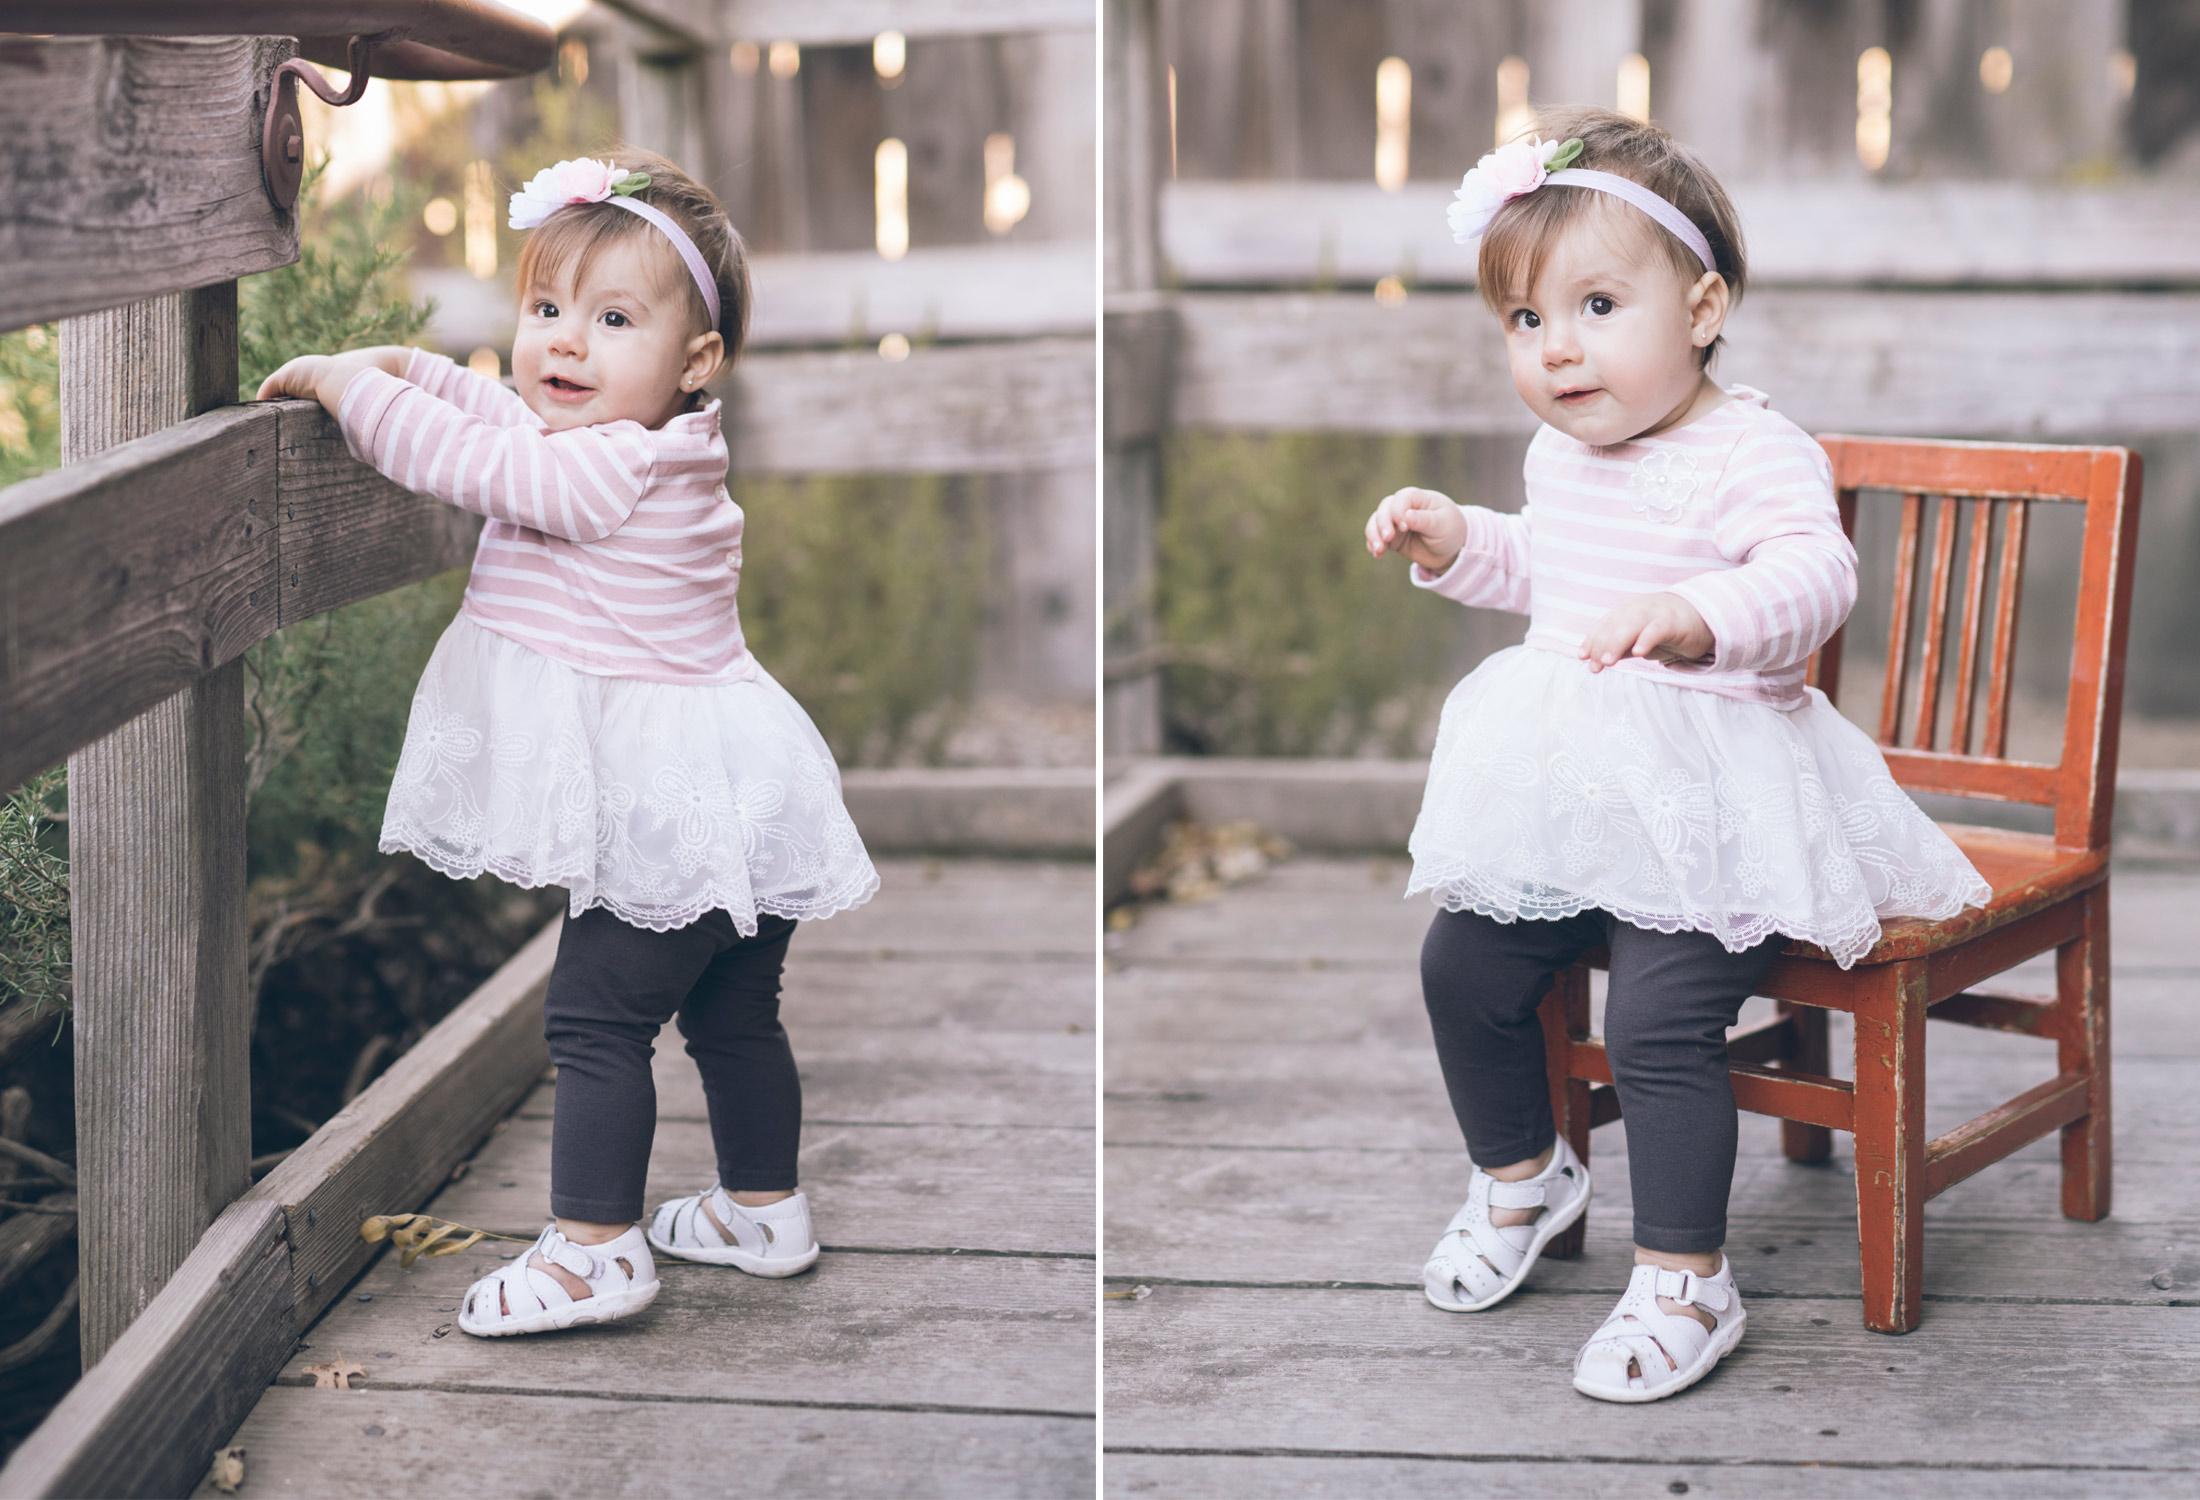 walnut-creek-photoshoot-with-one-year-old-baby.jpg